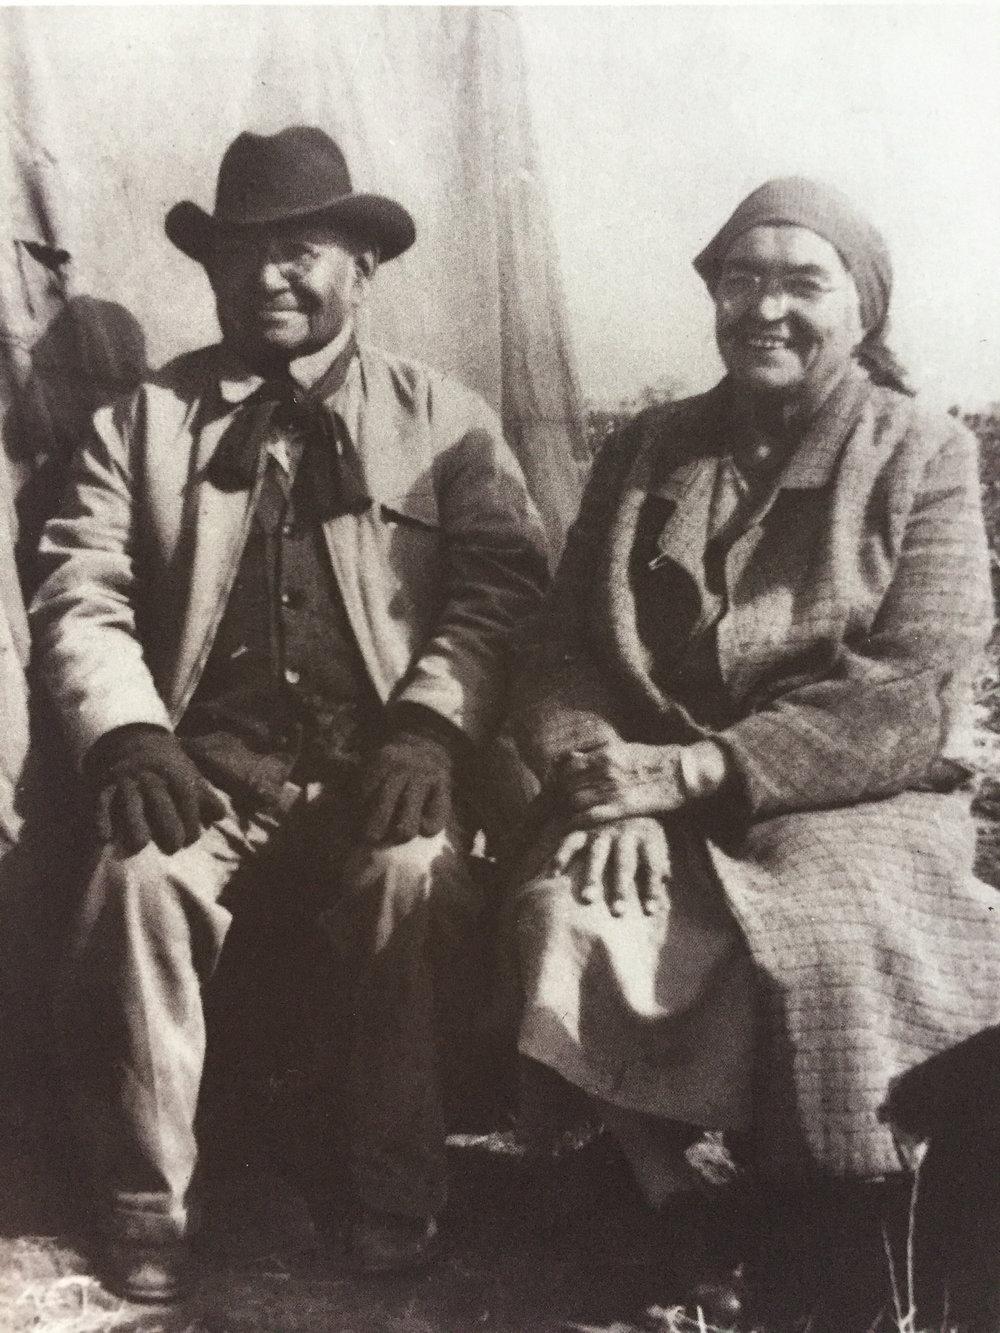 Blossom Haozous, Chiricahua Fort Sill Apache (1893-1981